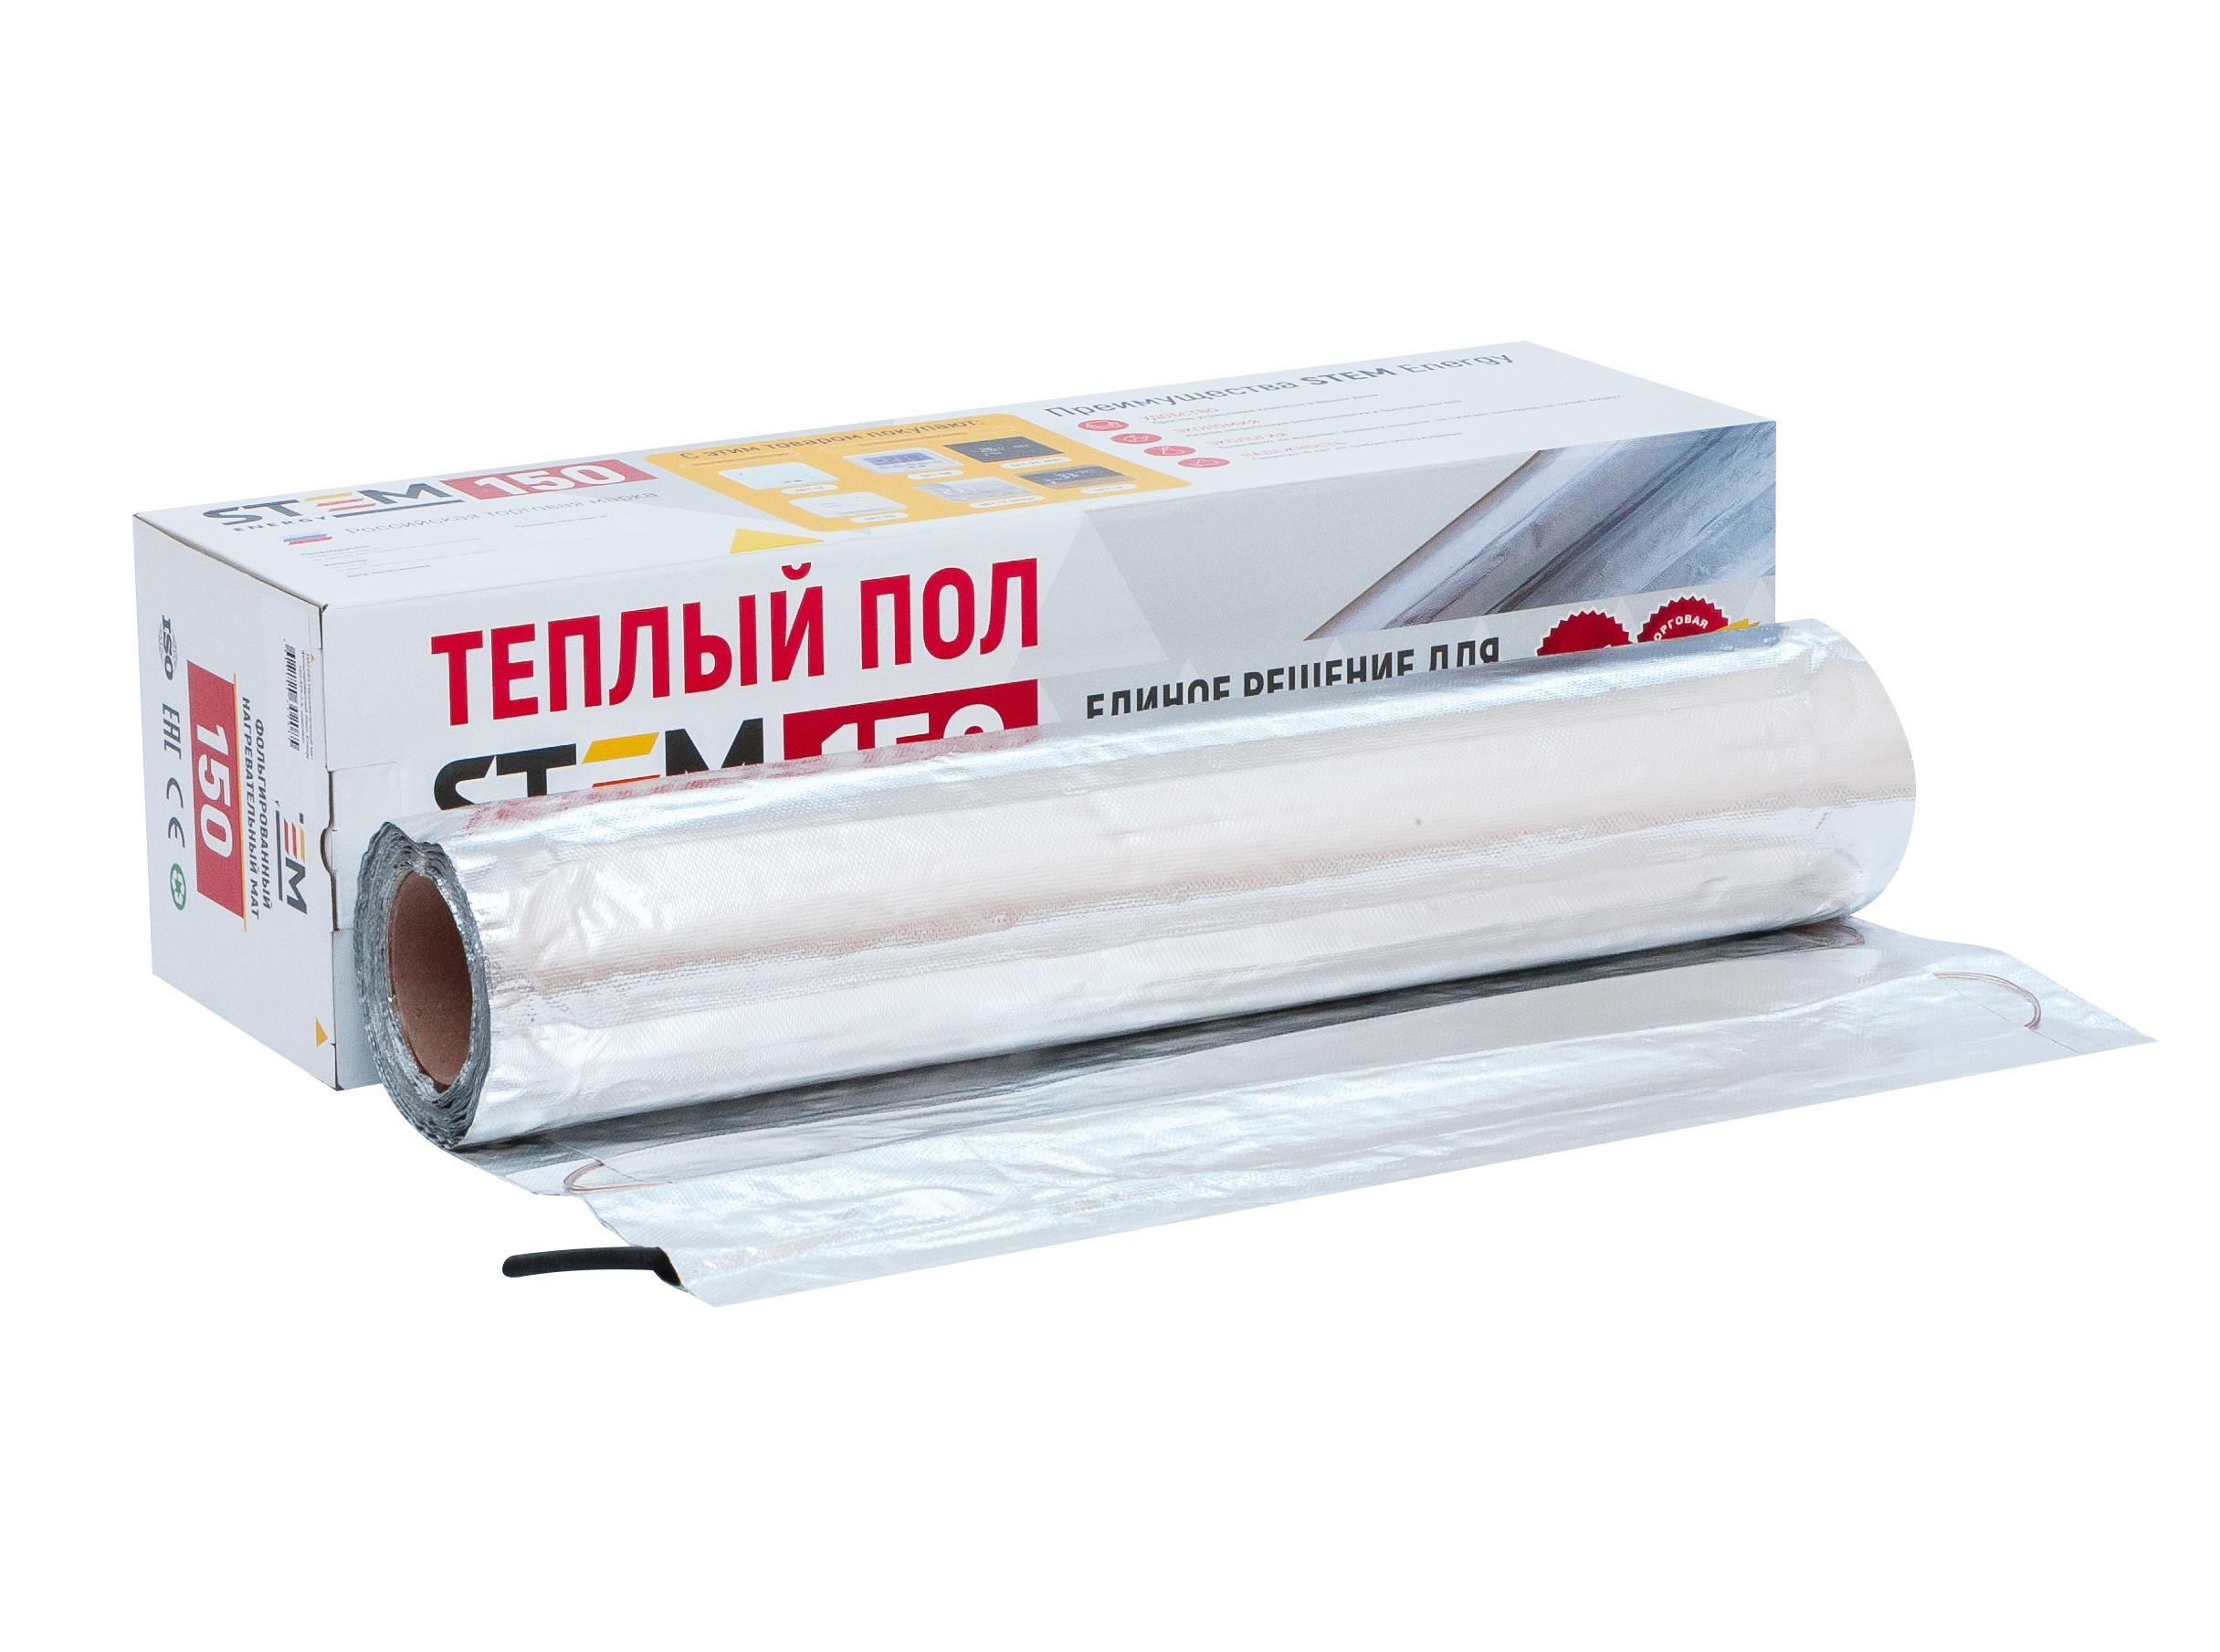 Теплый пол Stem energy 150-525-3.5